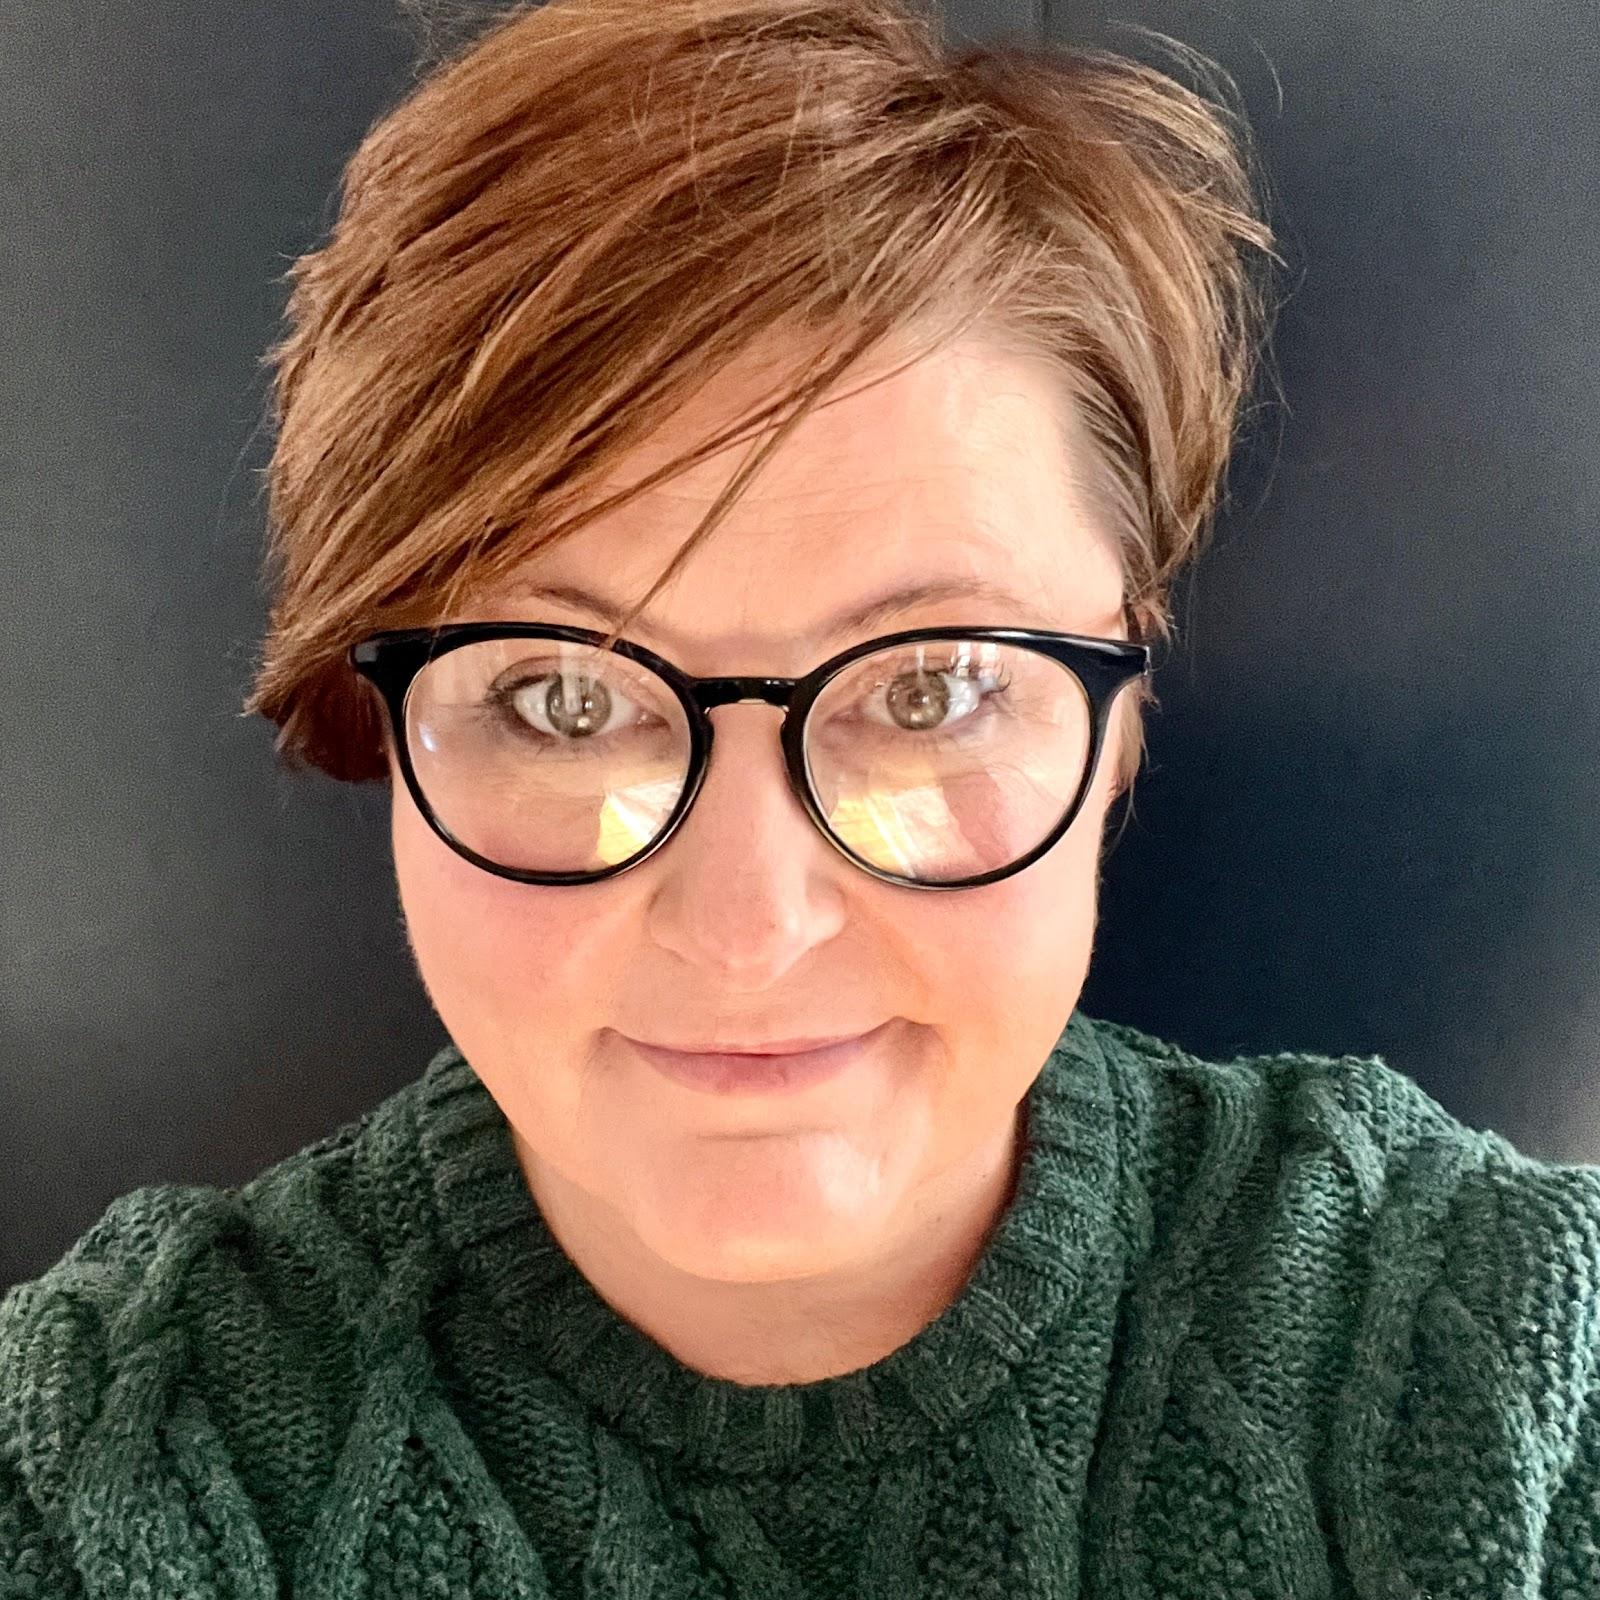 into our Hawaiian vacation